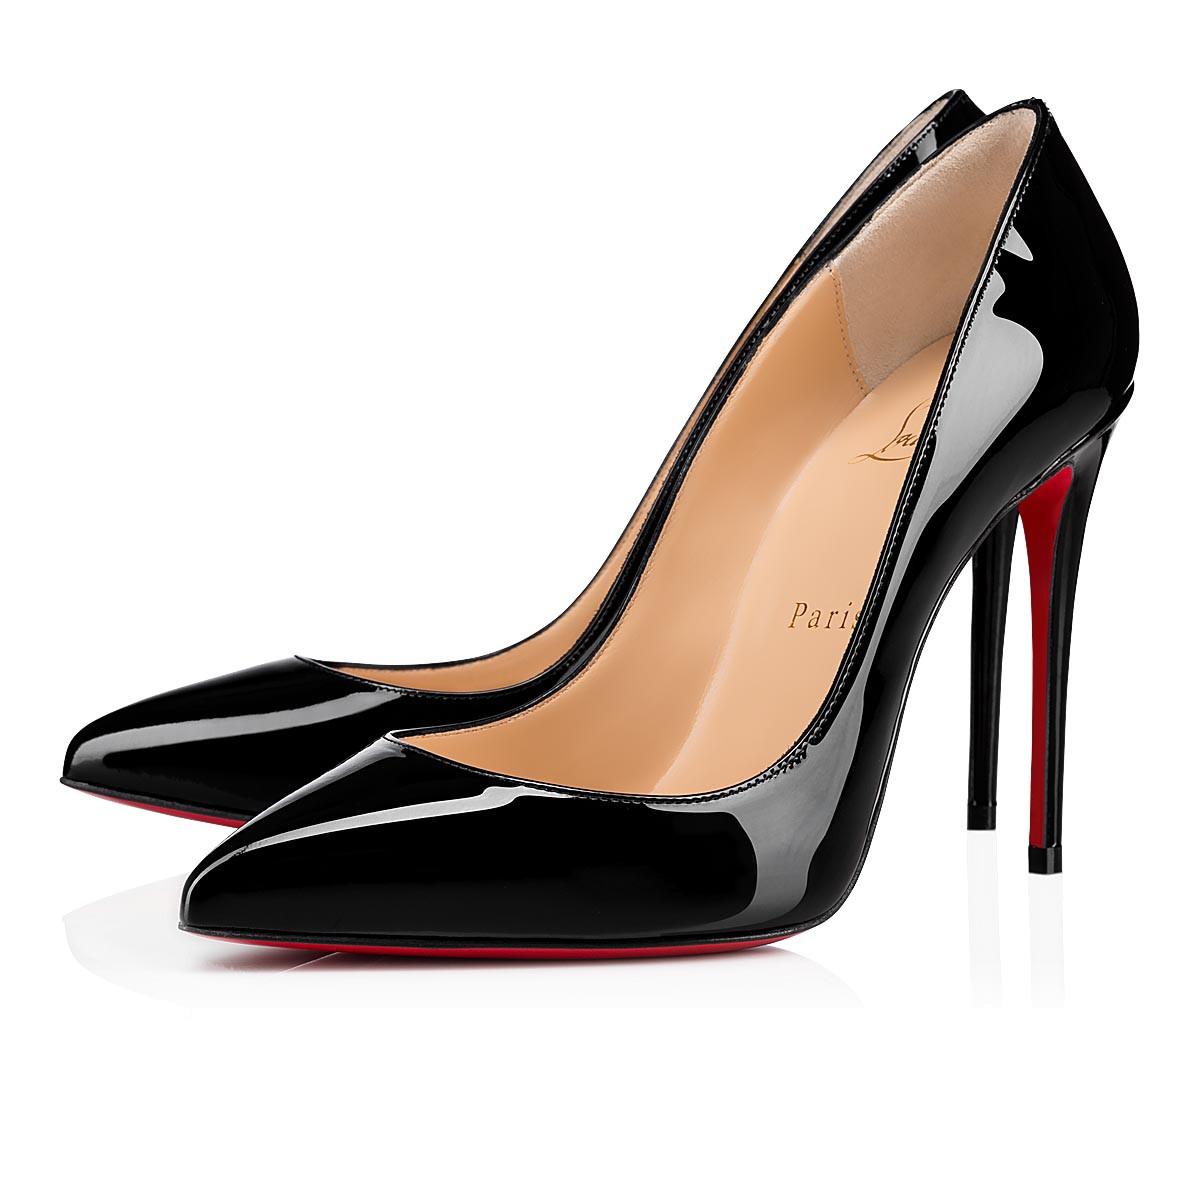 Christian Louboutin Pigalle Follies Black Patent Leather Pumps